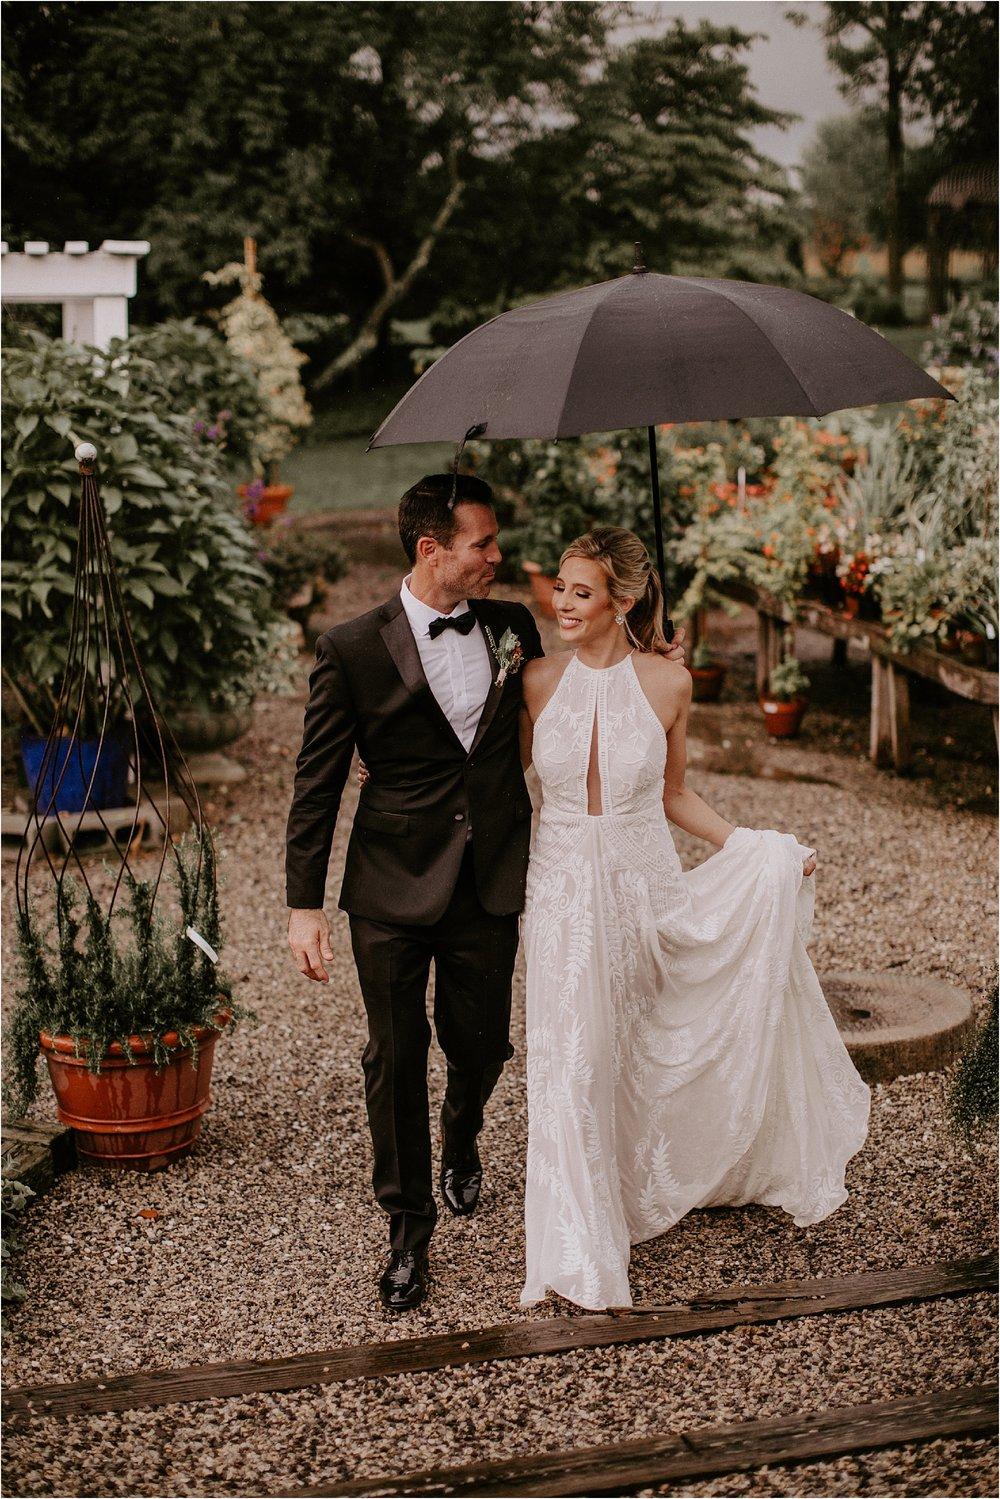 Sarah_Brookhart_Hortulus_Farm_Garden_and_Nursey_Wedding_Photographer_0034.jpg